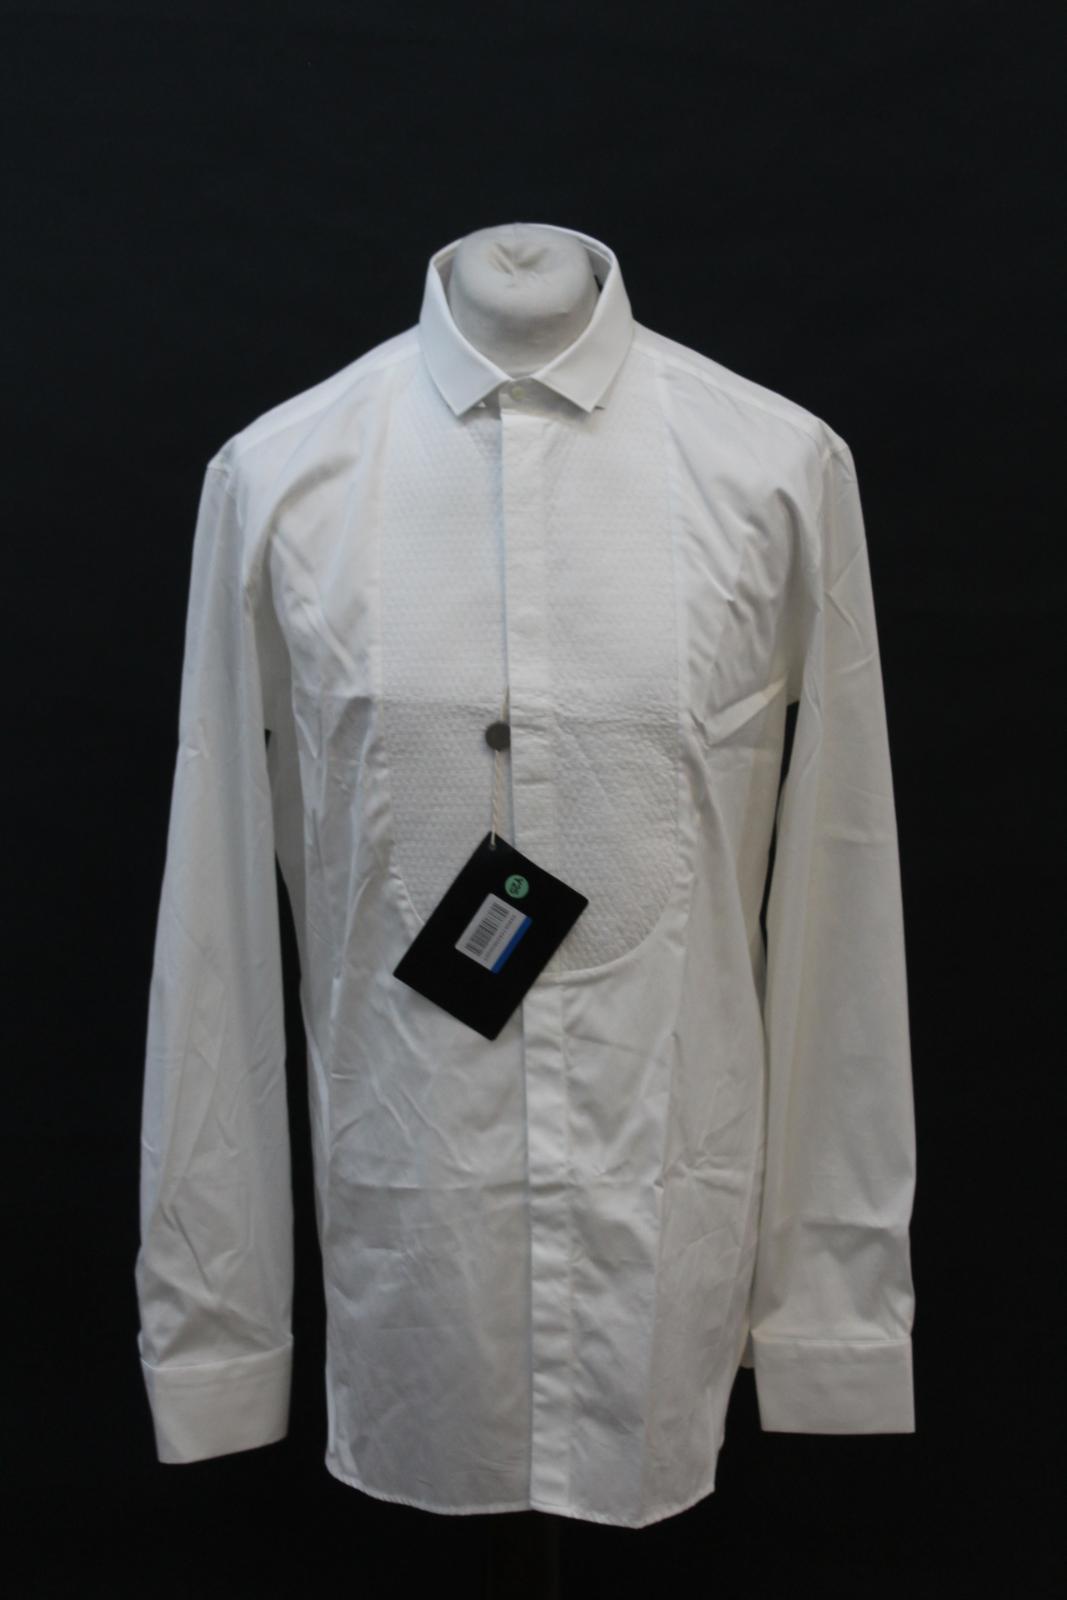 Neil-Barrett-Hombre-Blanco-De-Algodon-Manga-Larga-Camiseta-Formal-Cuello-17-034-43cm-BNWT miniatura 7